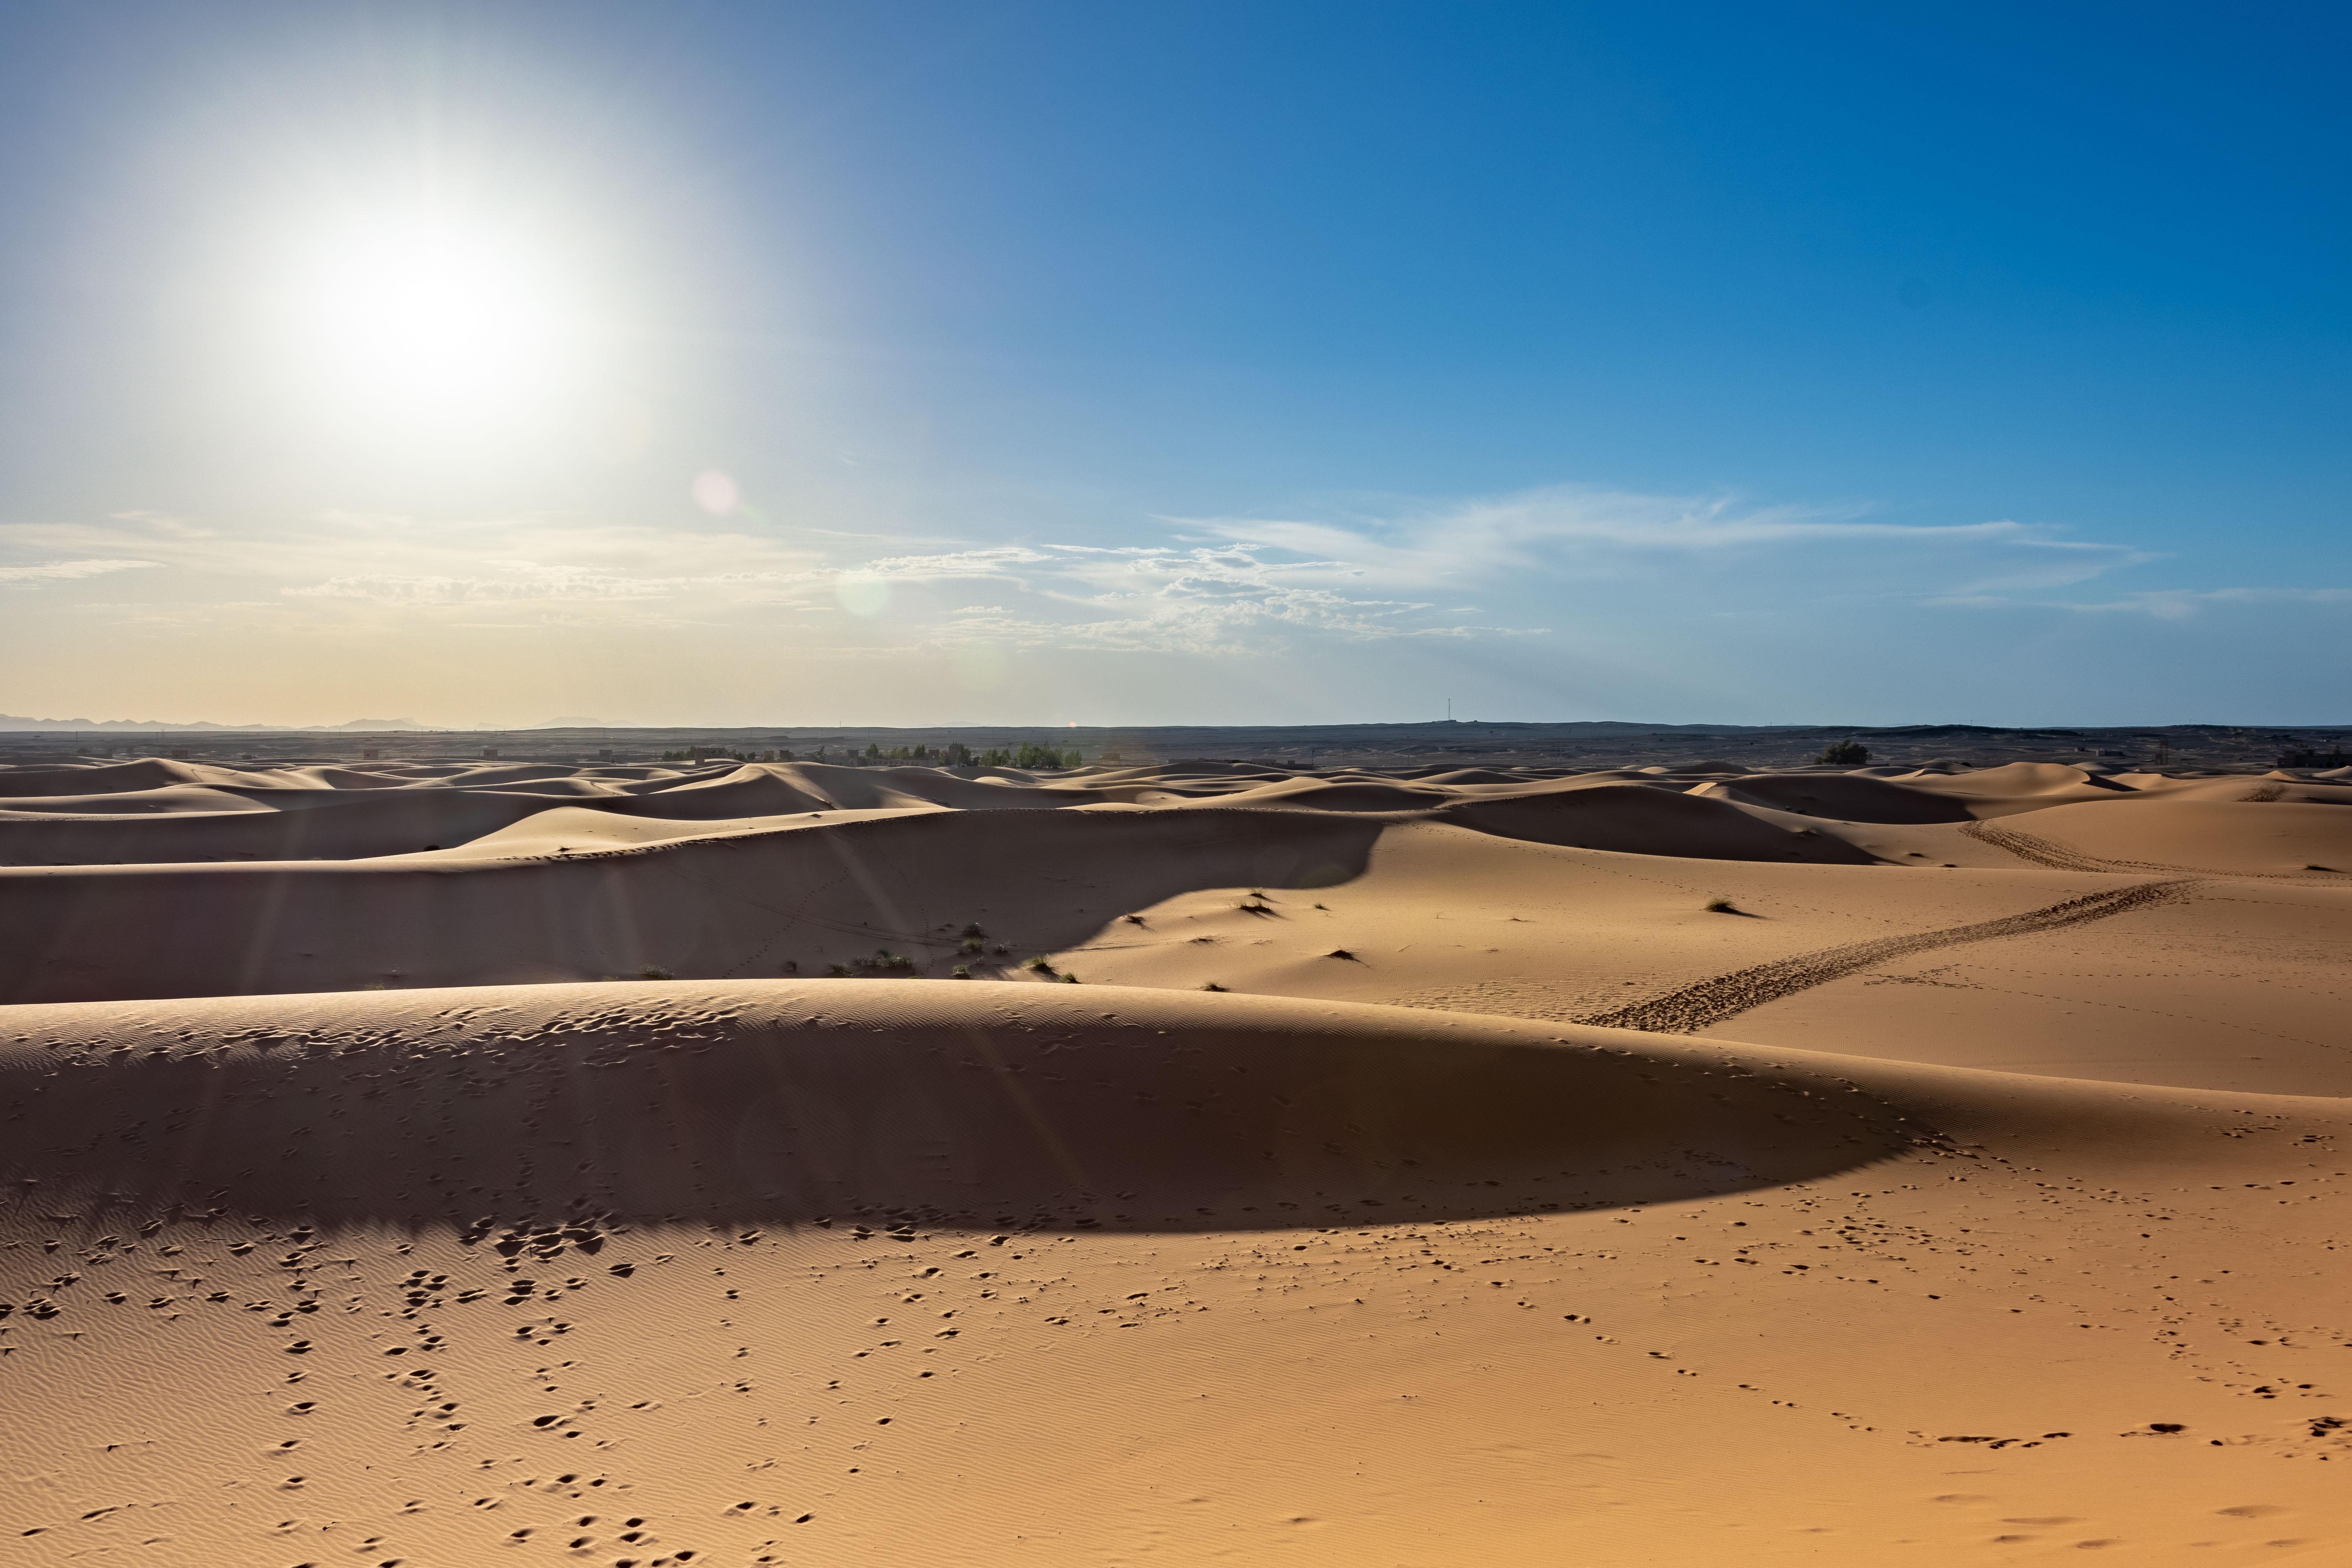 20181004_Marokko_098